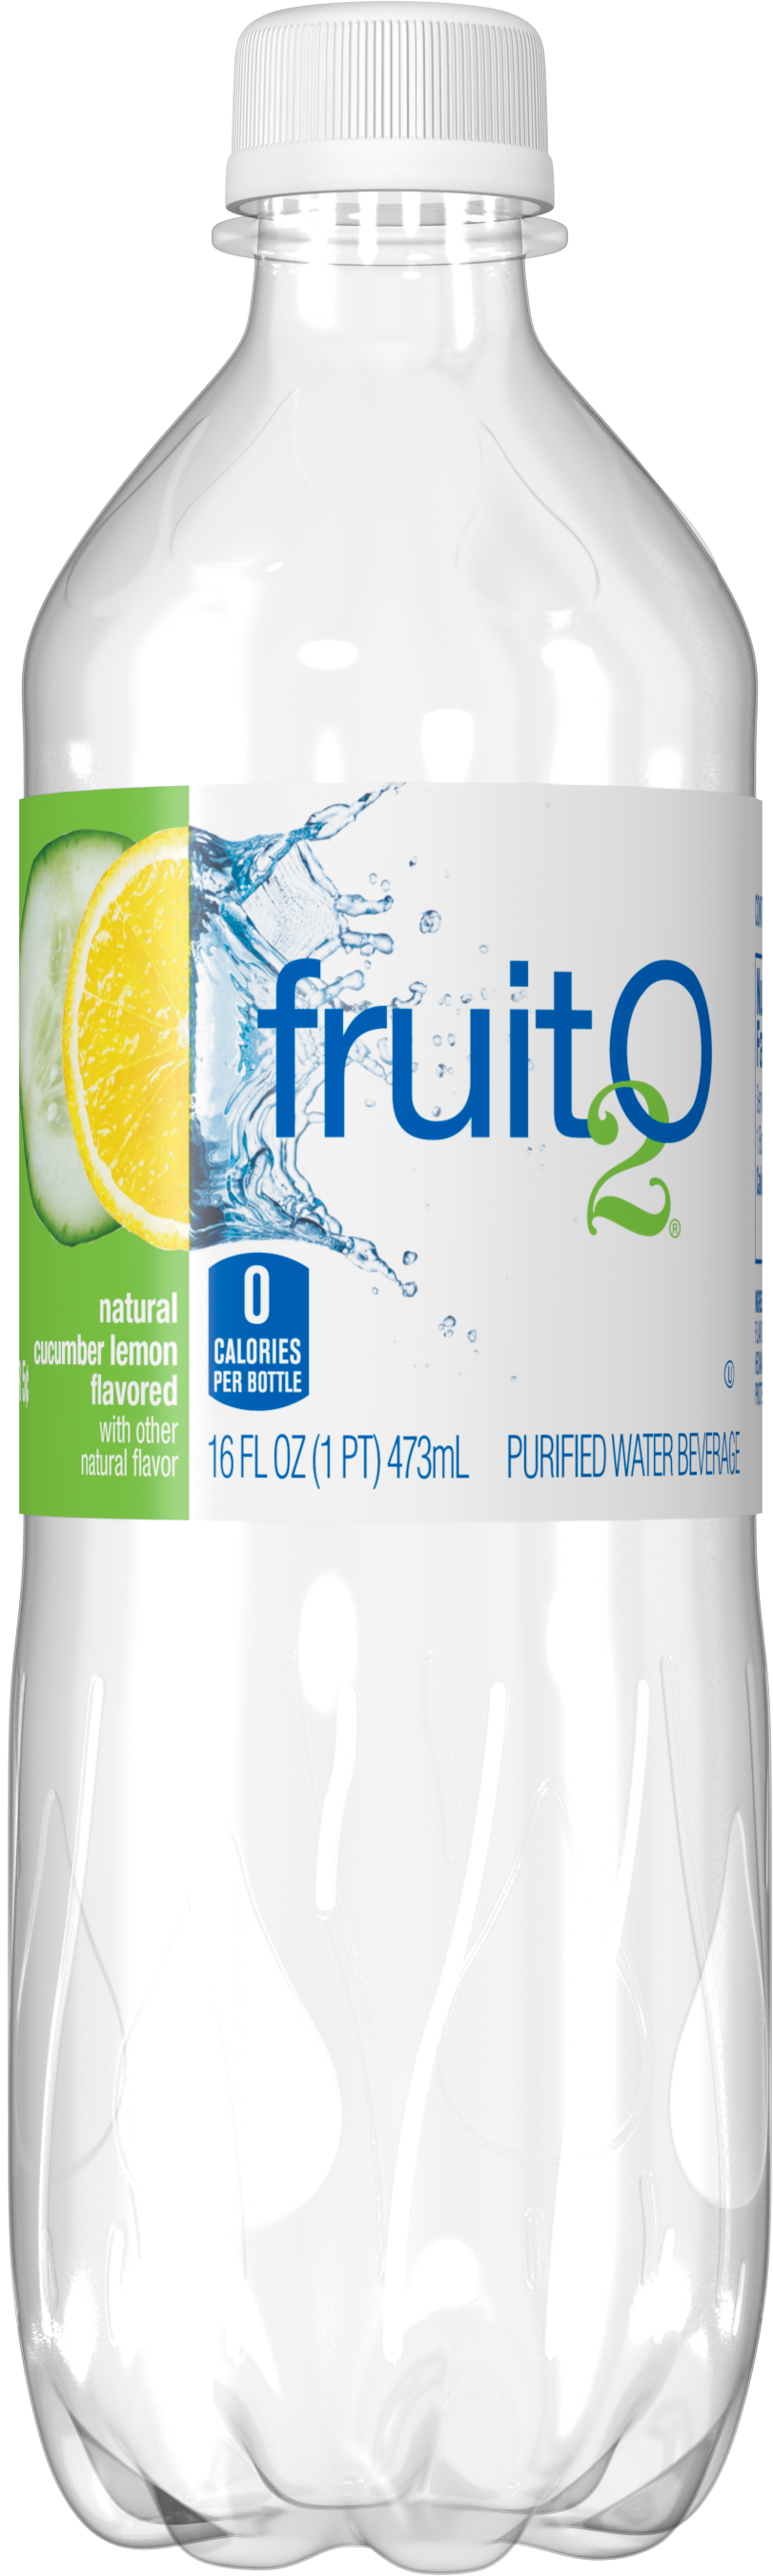 Fruit20